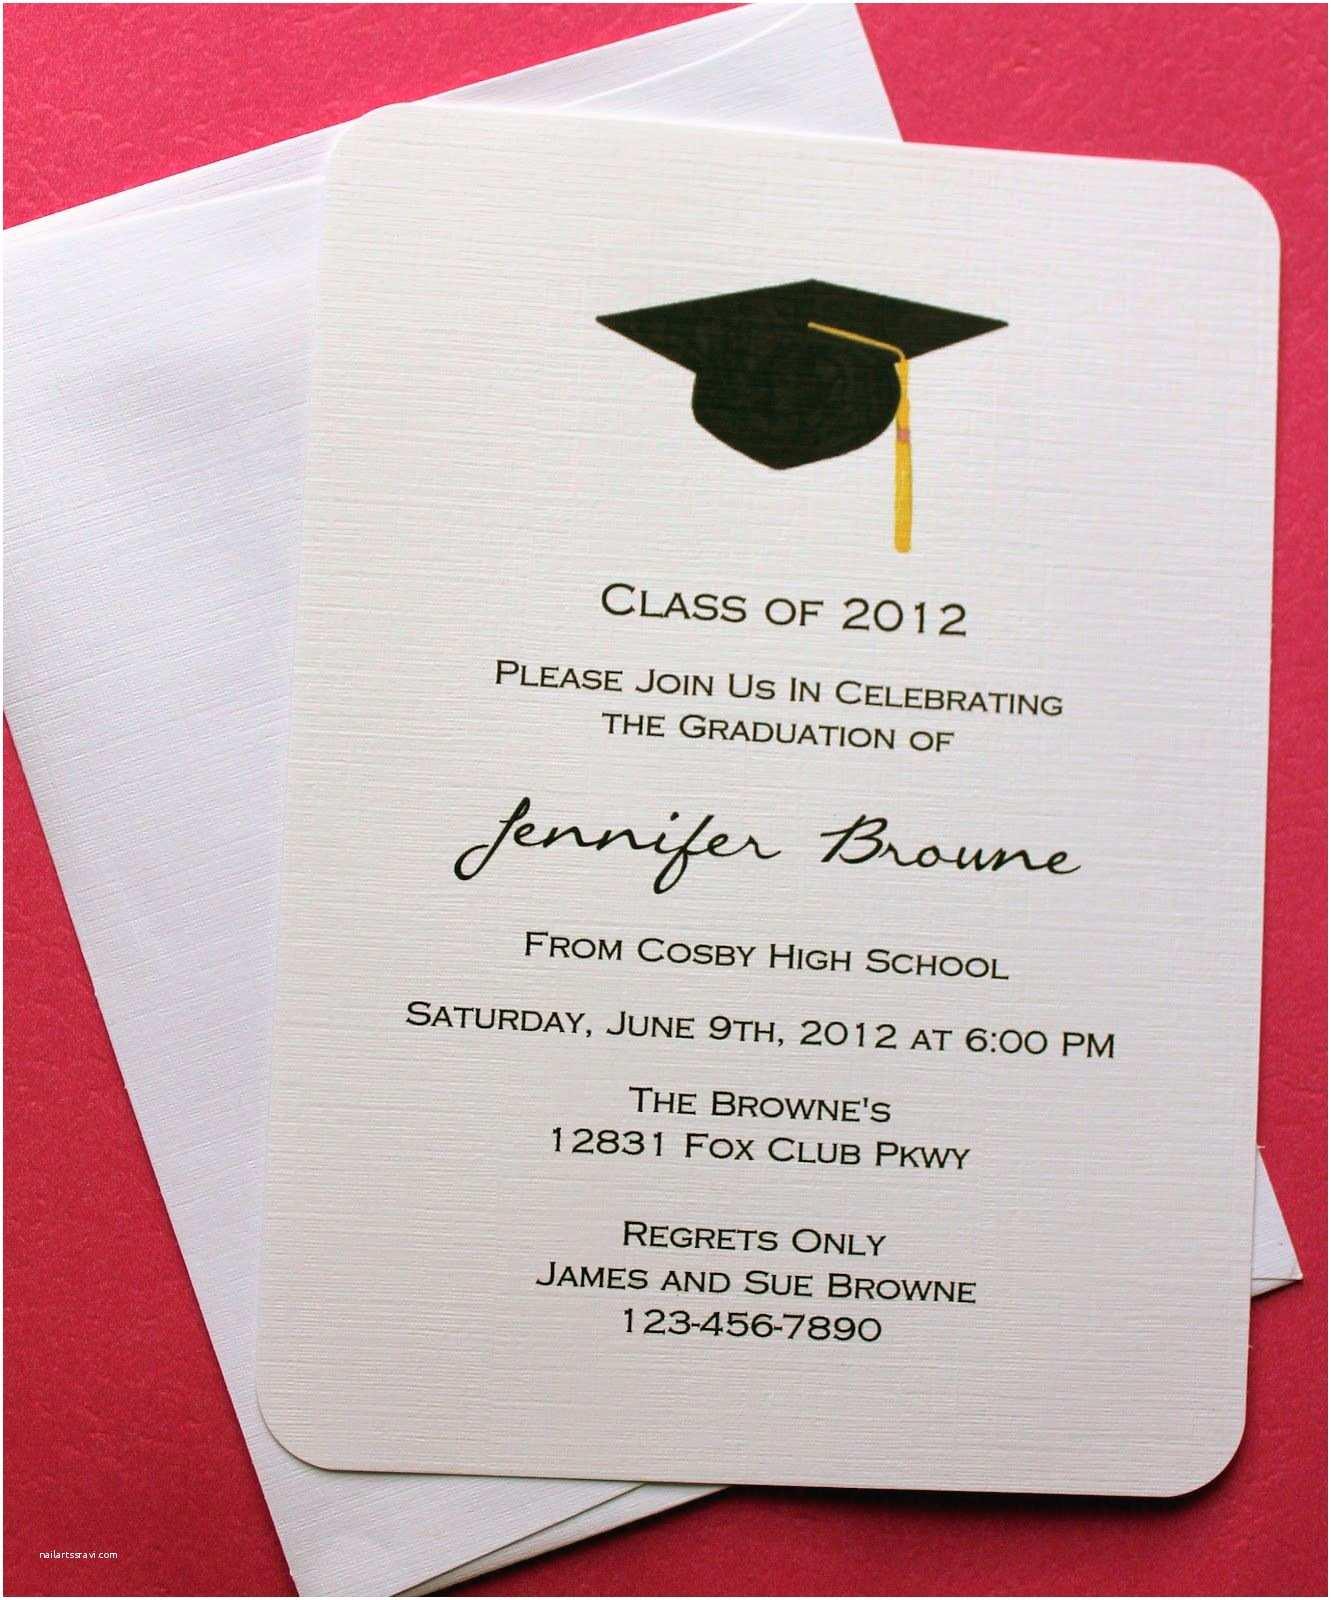 Free Graduation Invitation Templates Graduation Invitation Template Graduation Invitation